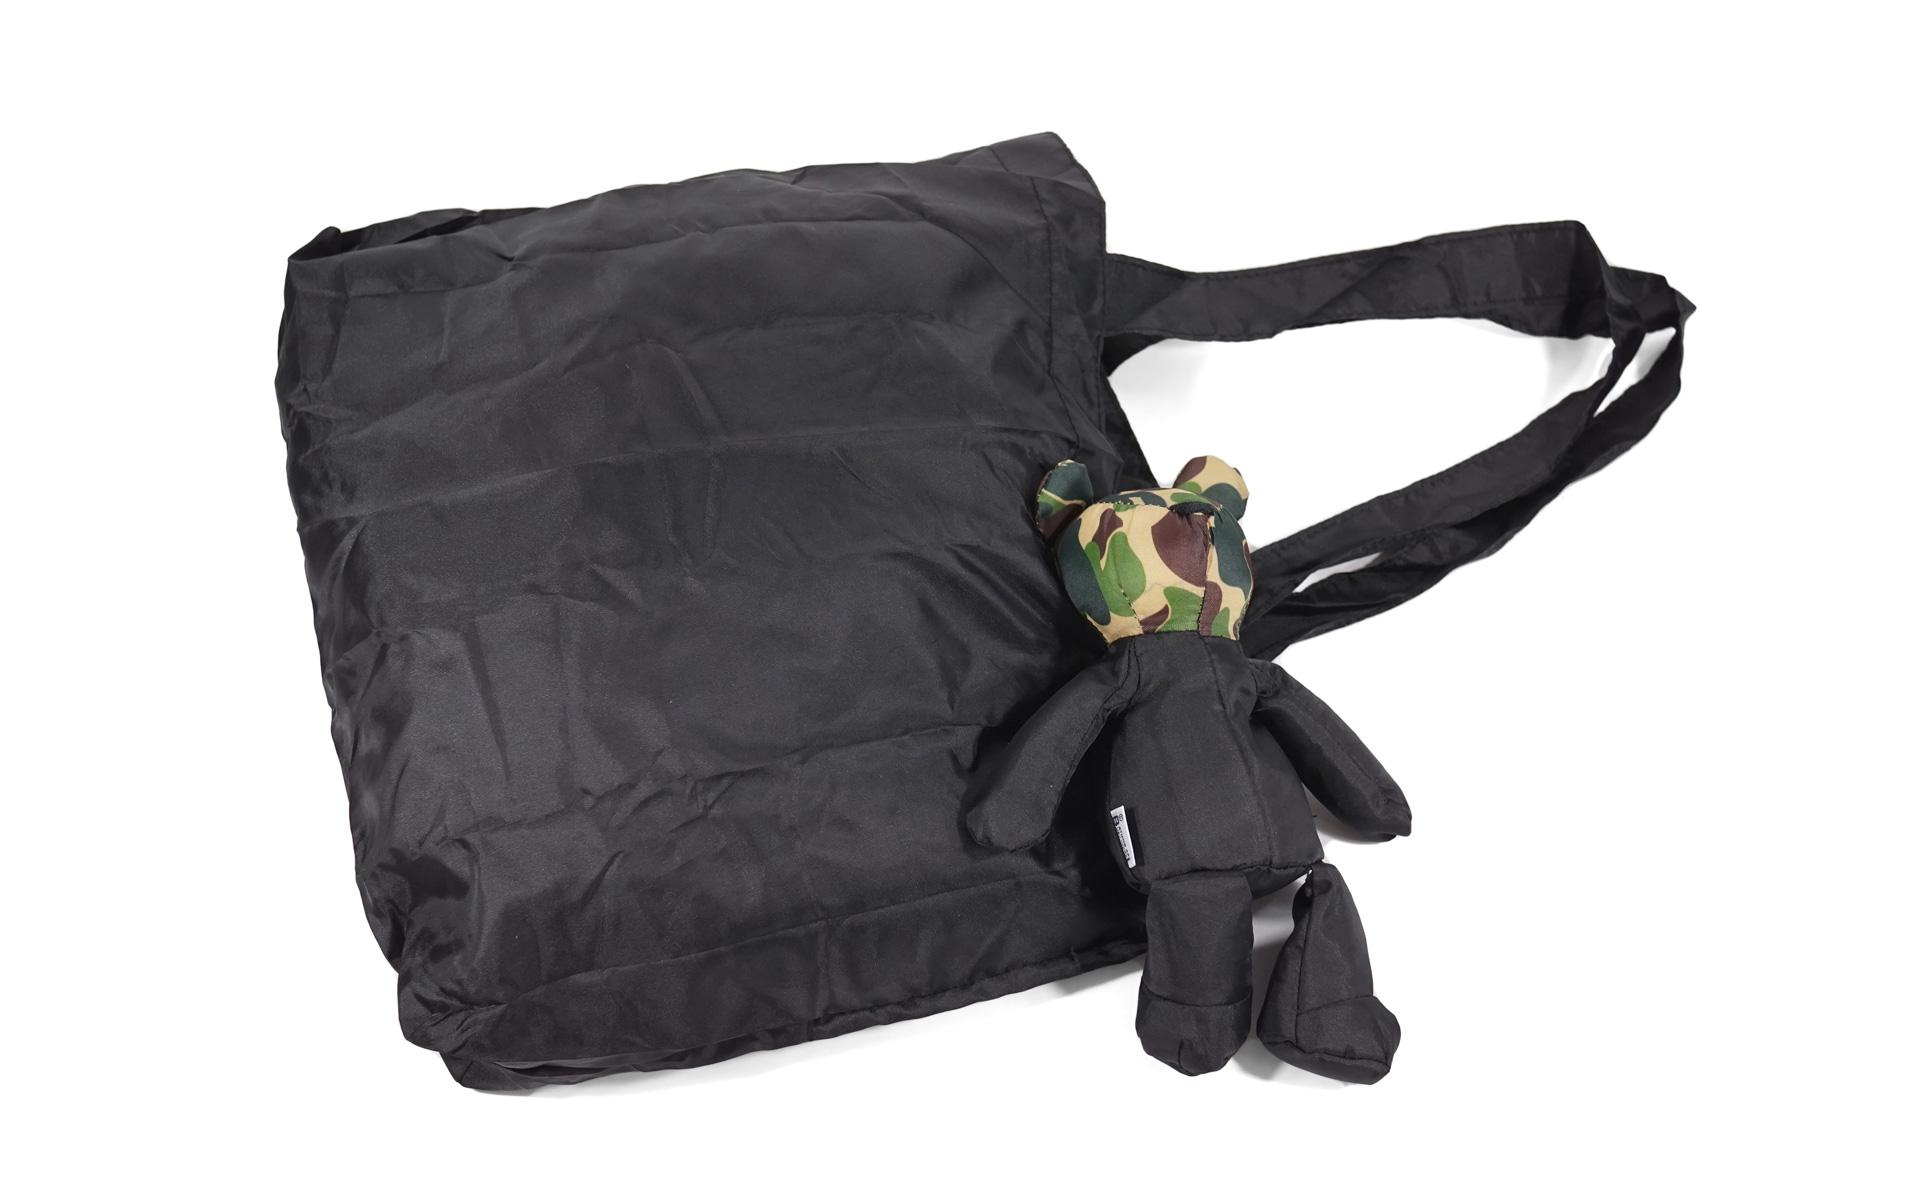 Bape Lucky Bag Teddy Tote Black